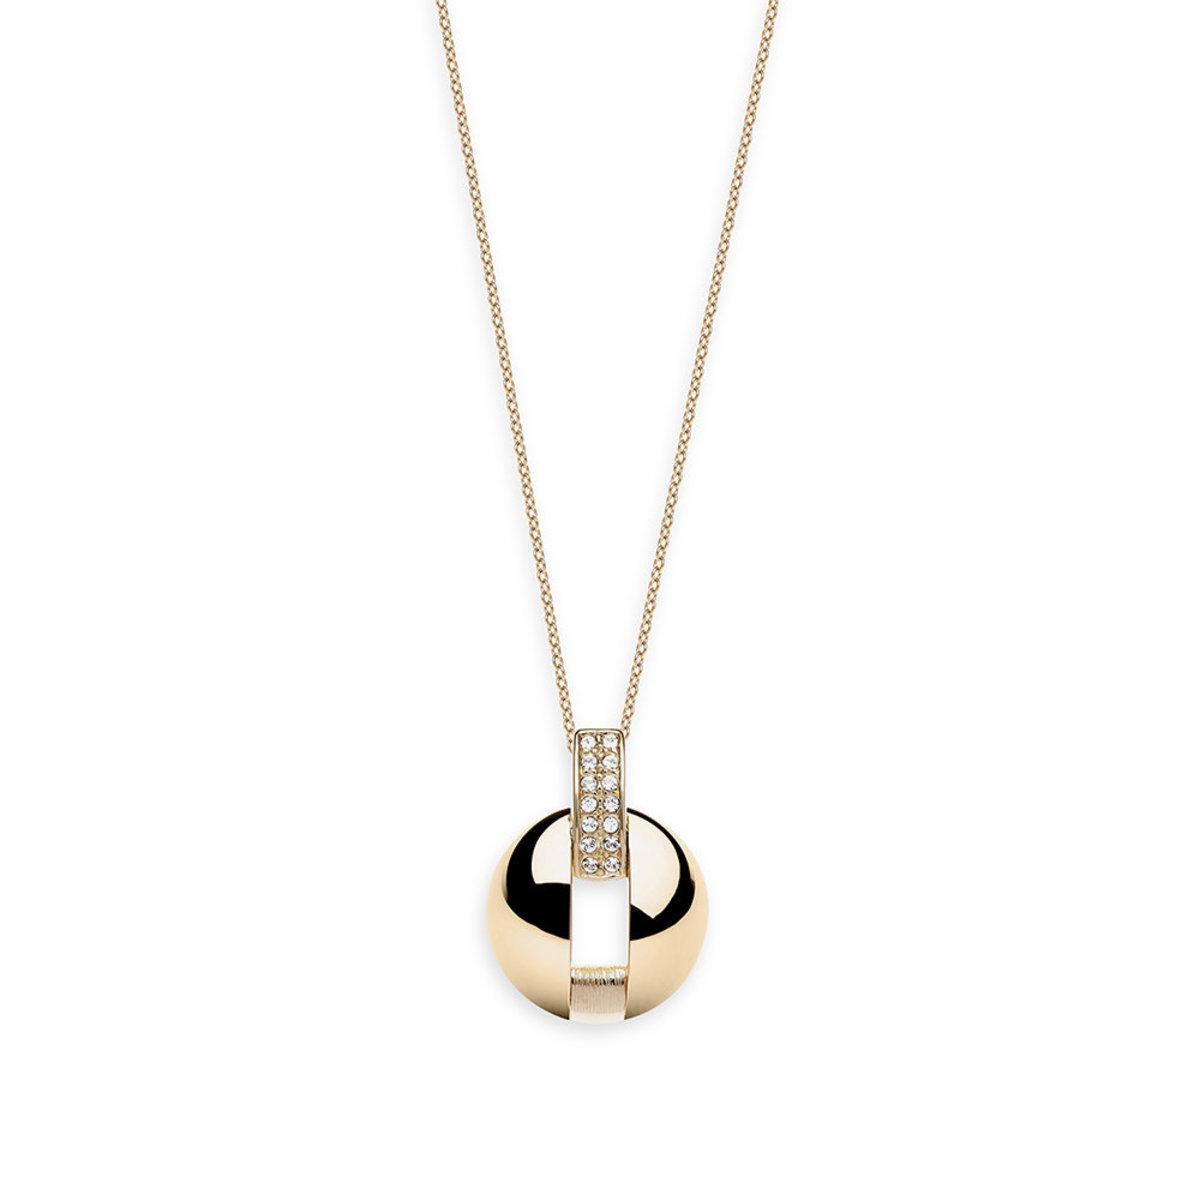 Reflection: gold plating, Swarovski crystal, round pendant necklace